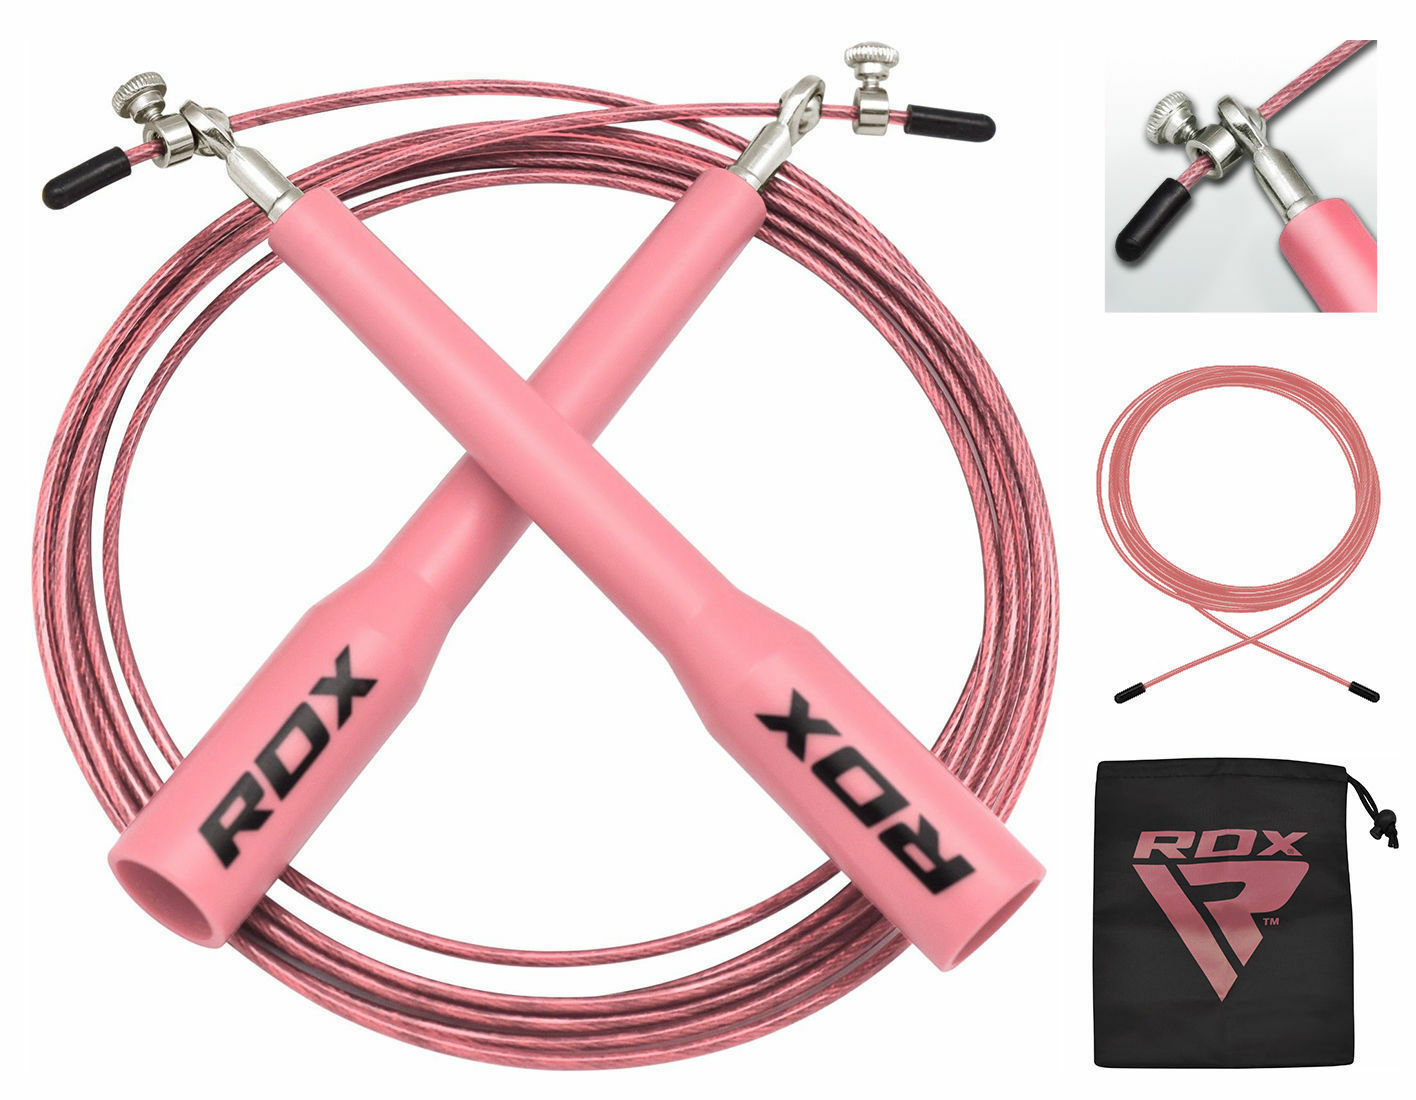 RDX Springseil Speed Rope Boxen Profi Fitness Hüpfseil Seilspringen DE    New Listing